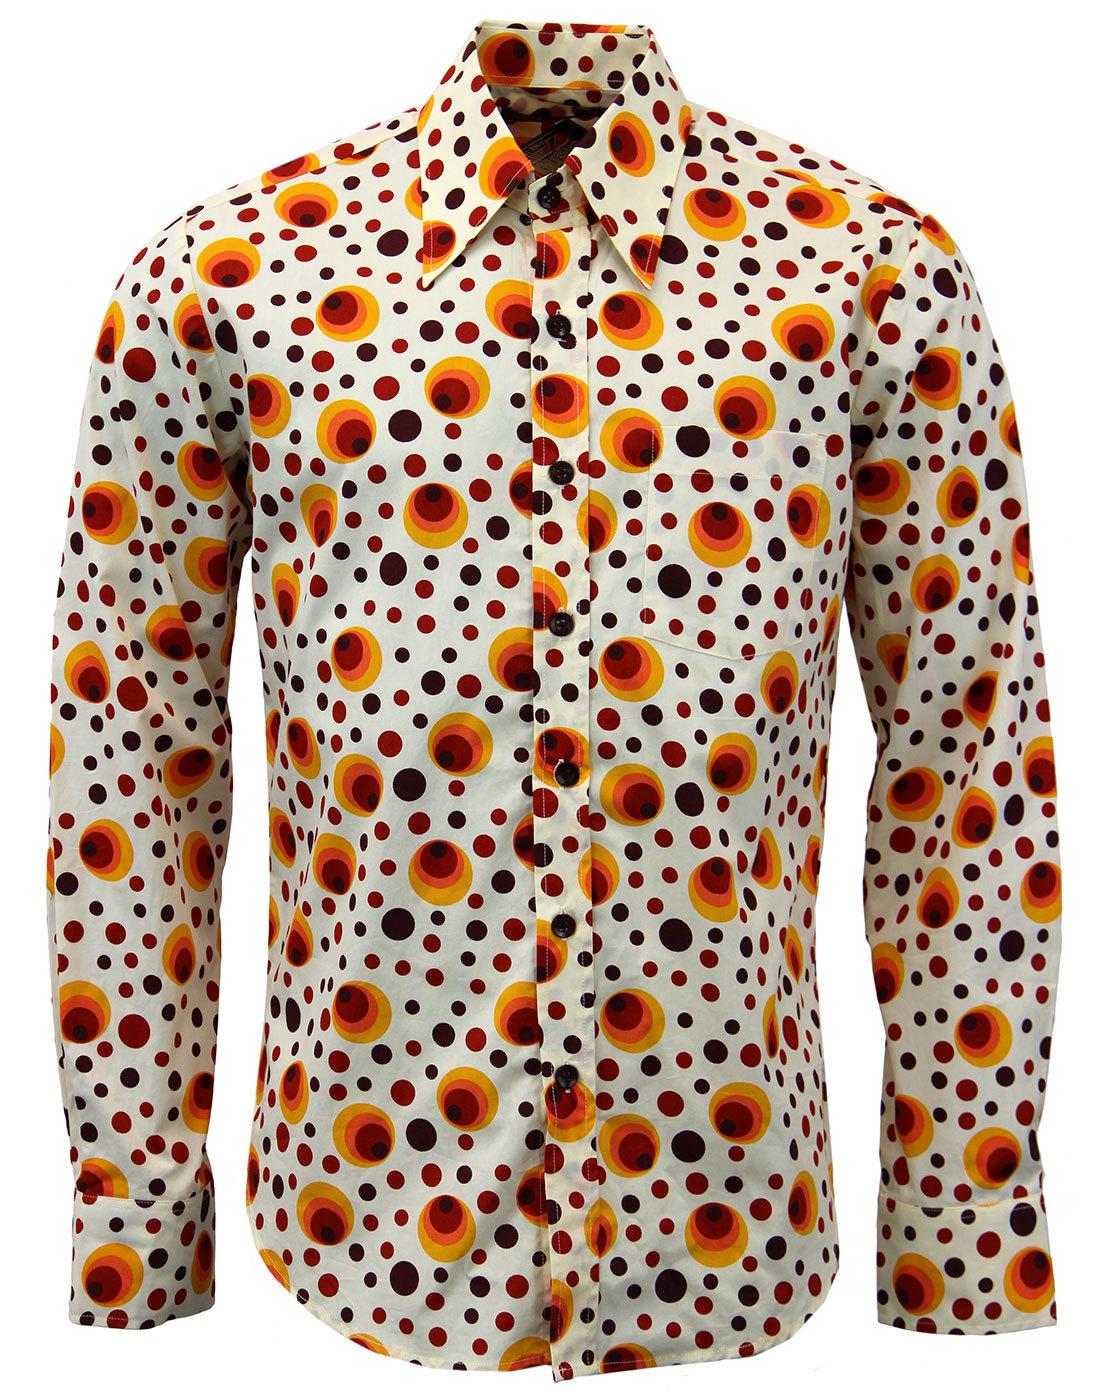 Dot CHENASKI Retro Seventies Op Art Mod Shirt